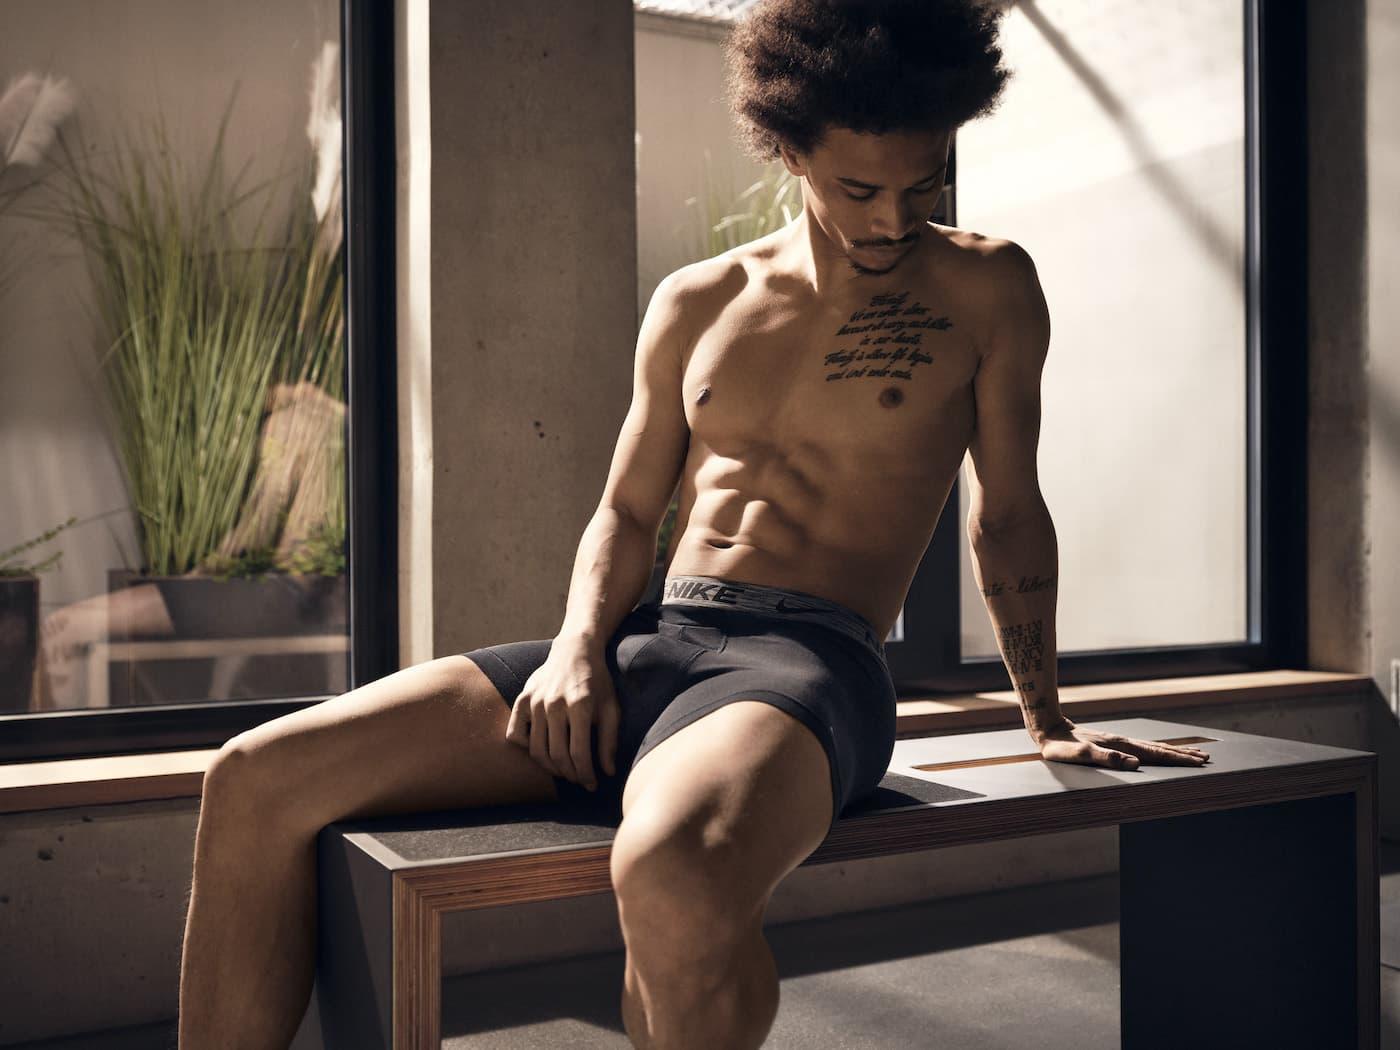 1. Nike Underwear FA21 Leroy Sané Nike Dri FIT